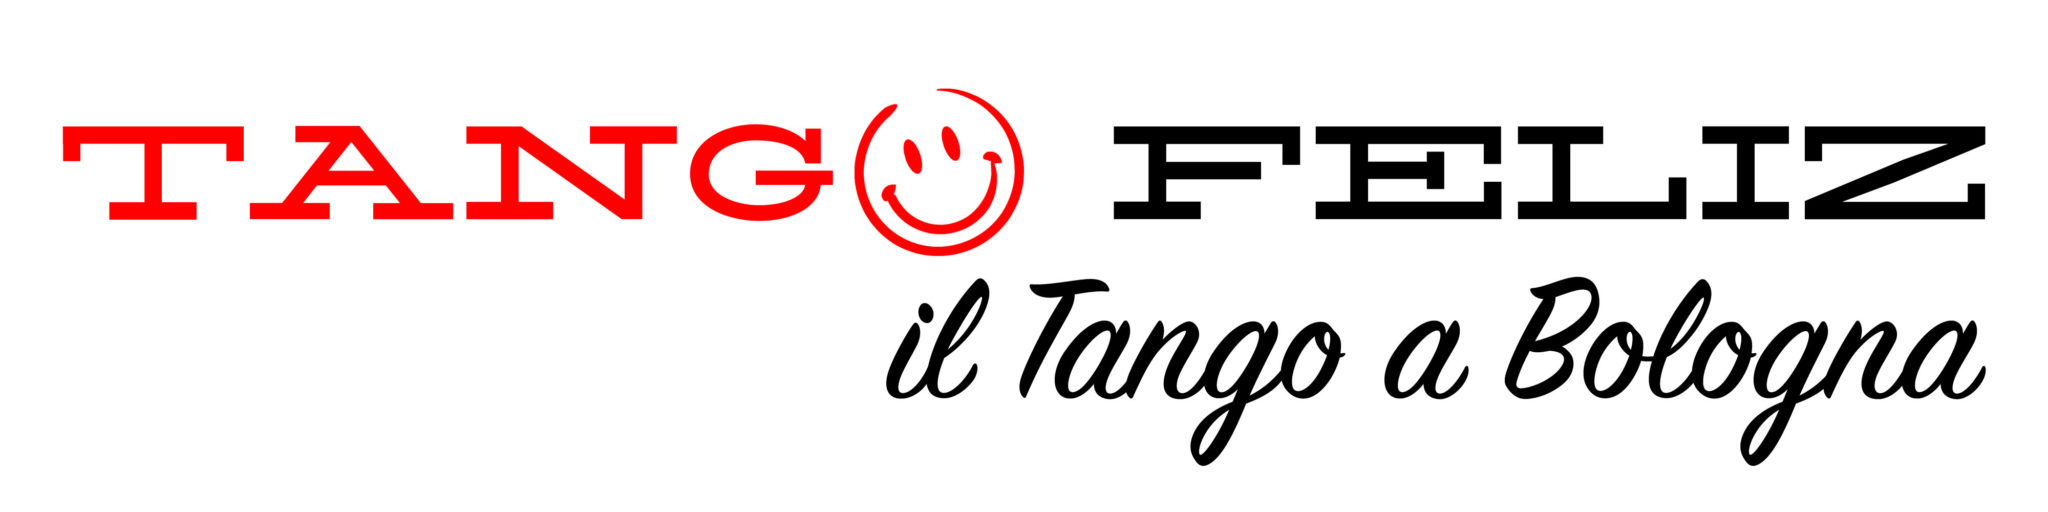 Tango Feliz